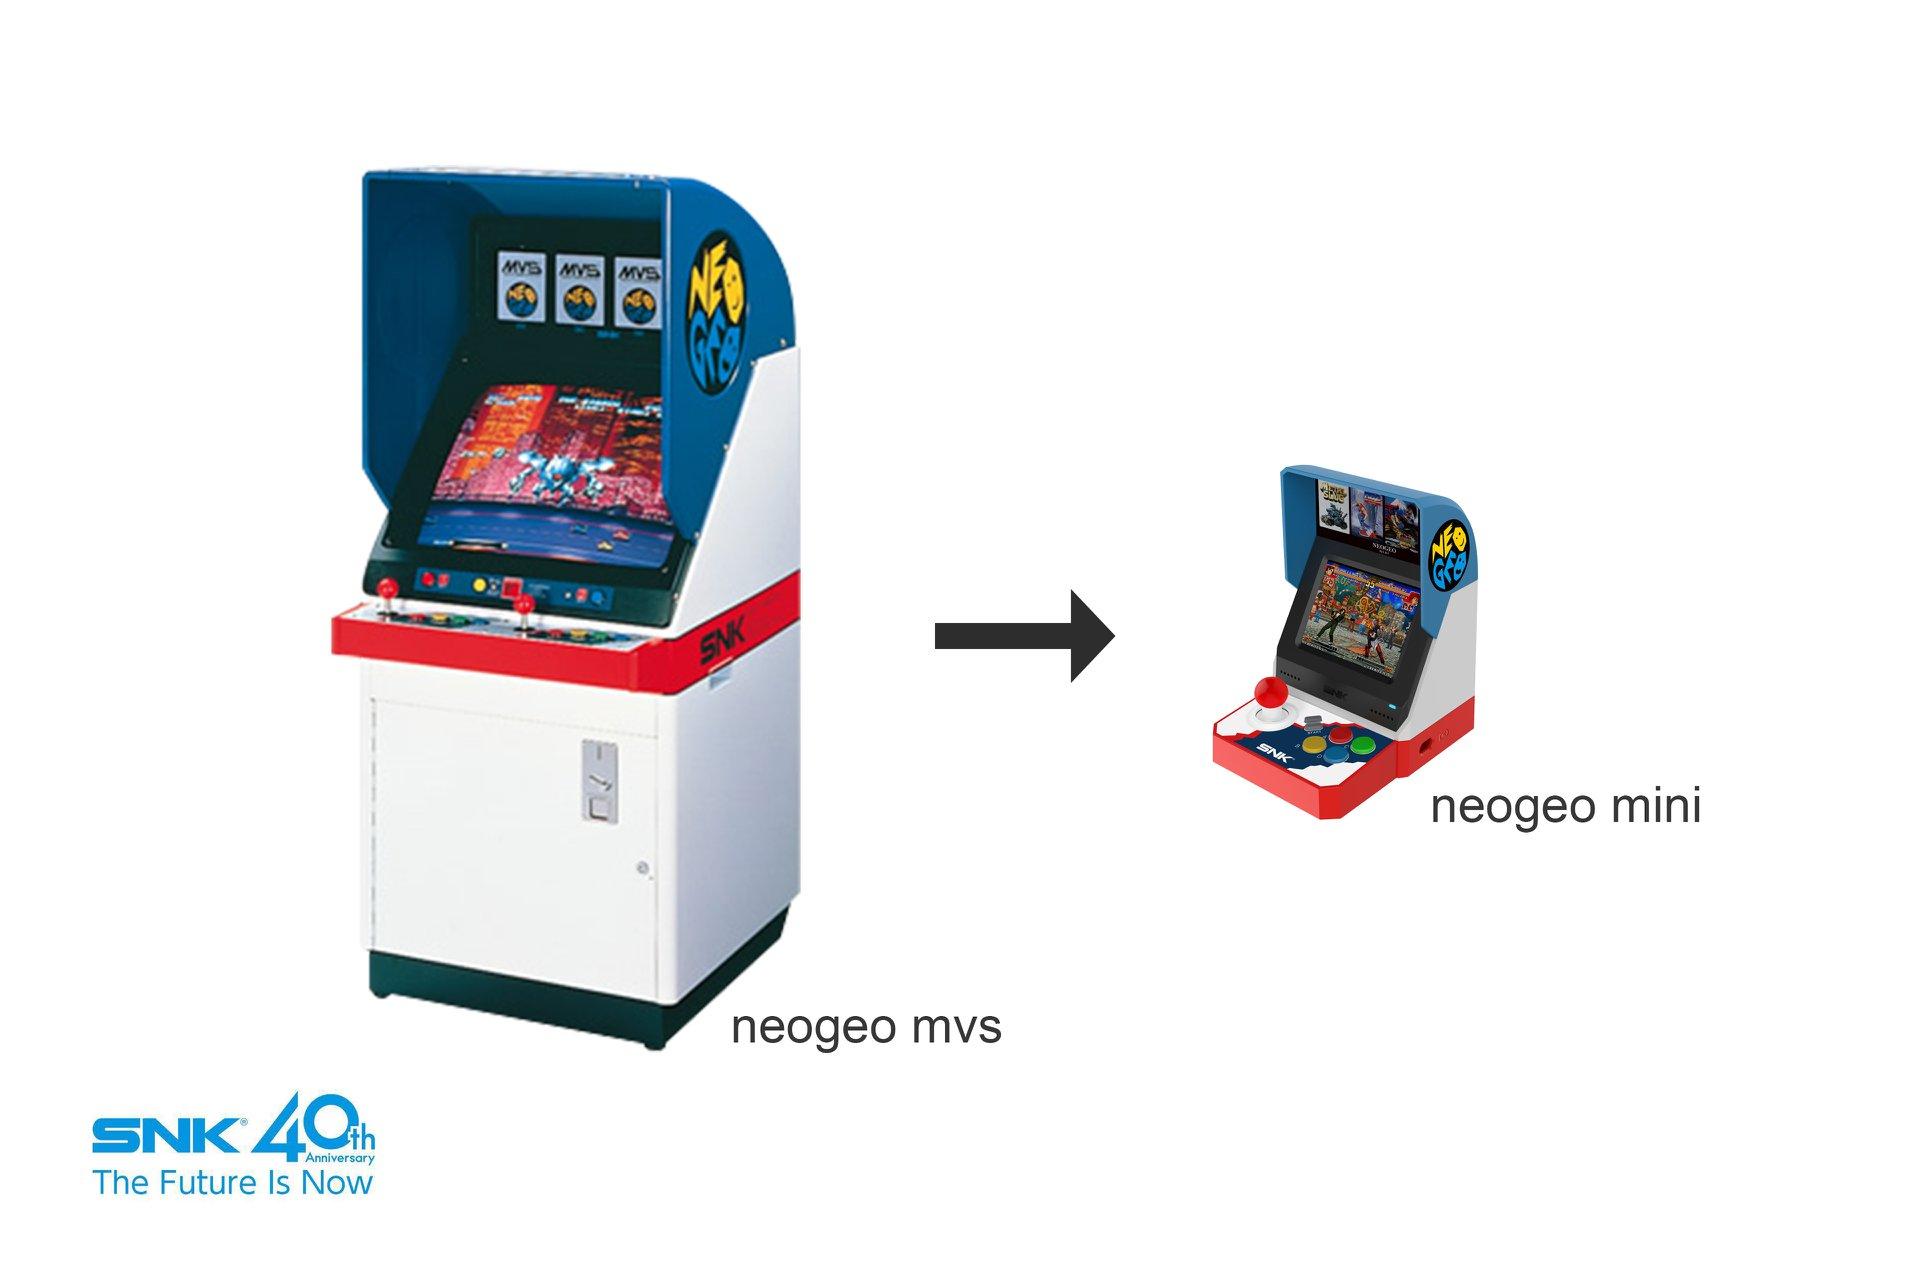 snk-neo-geo-mini-02-jeux-arcade